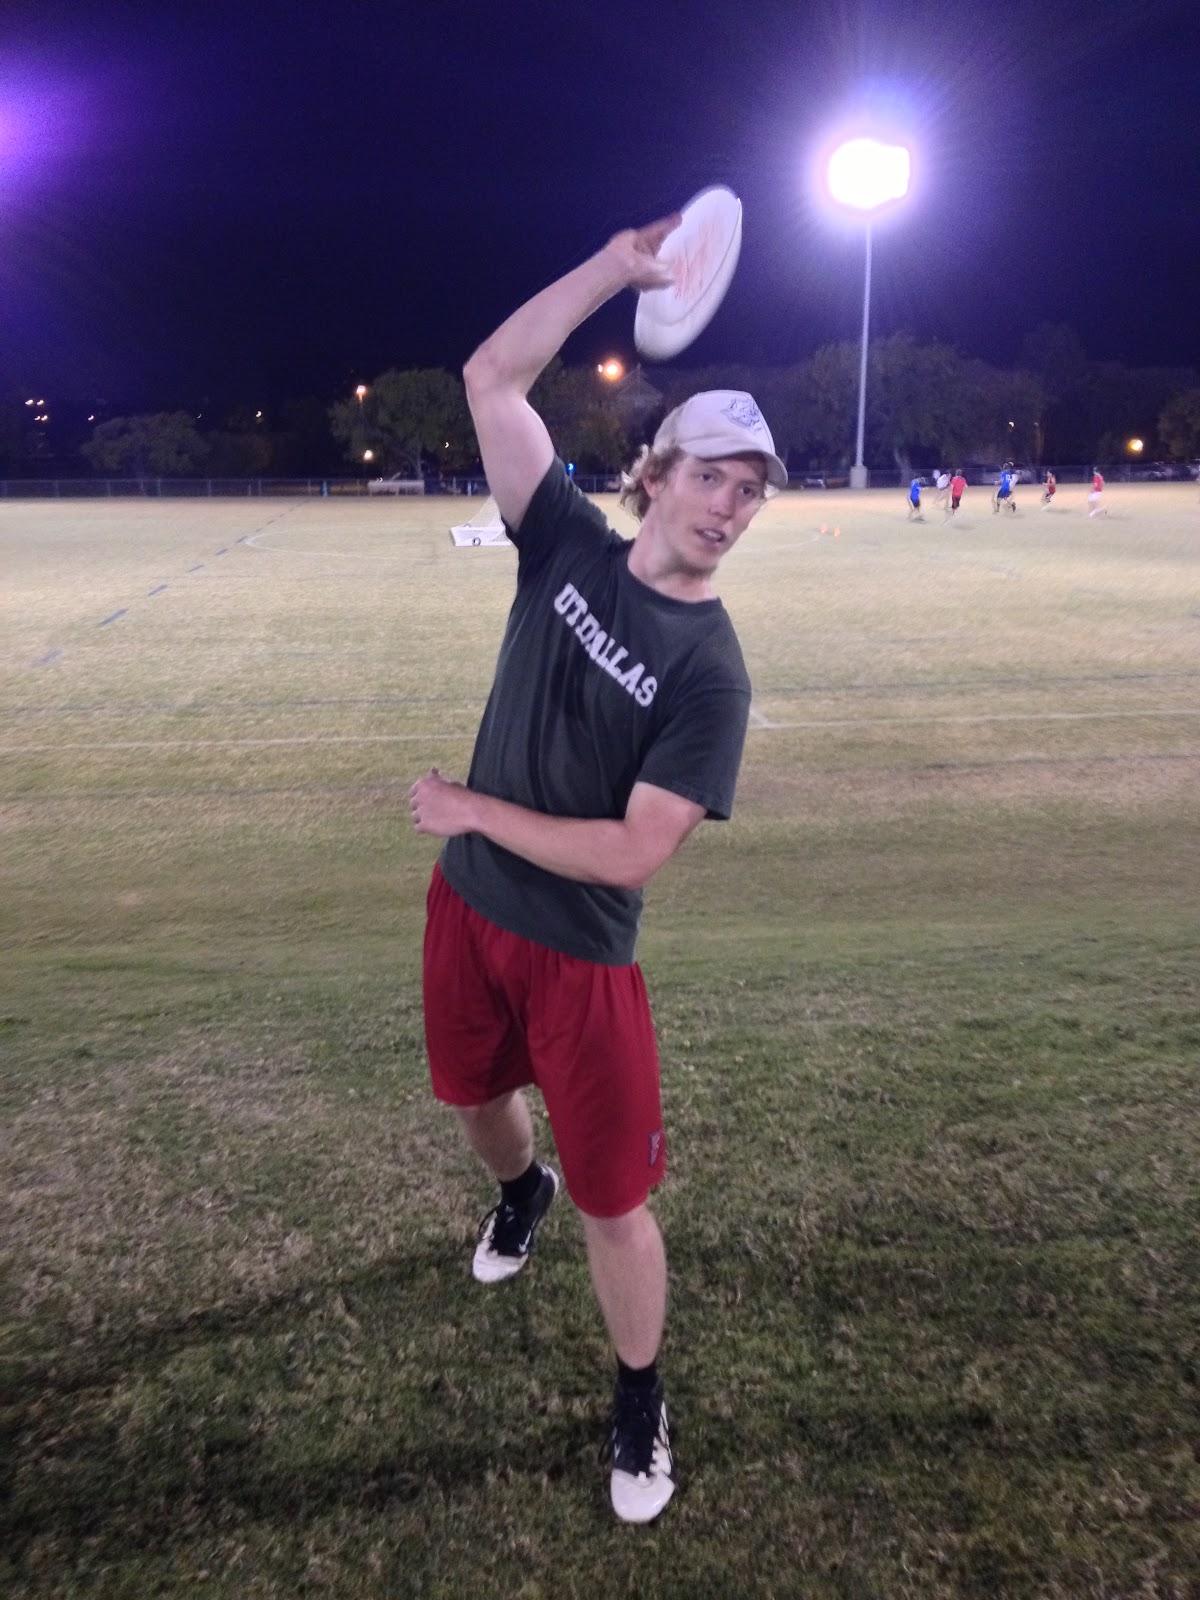 Hammer throw frisbee